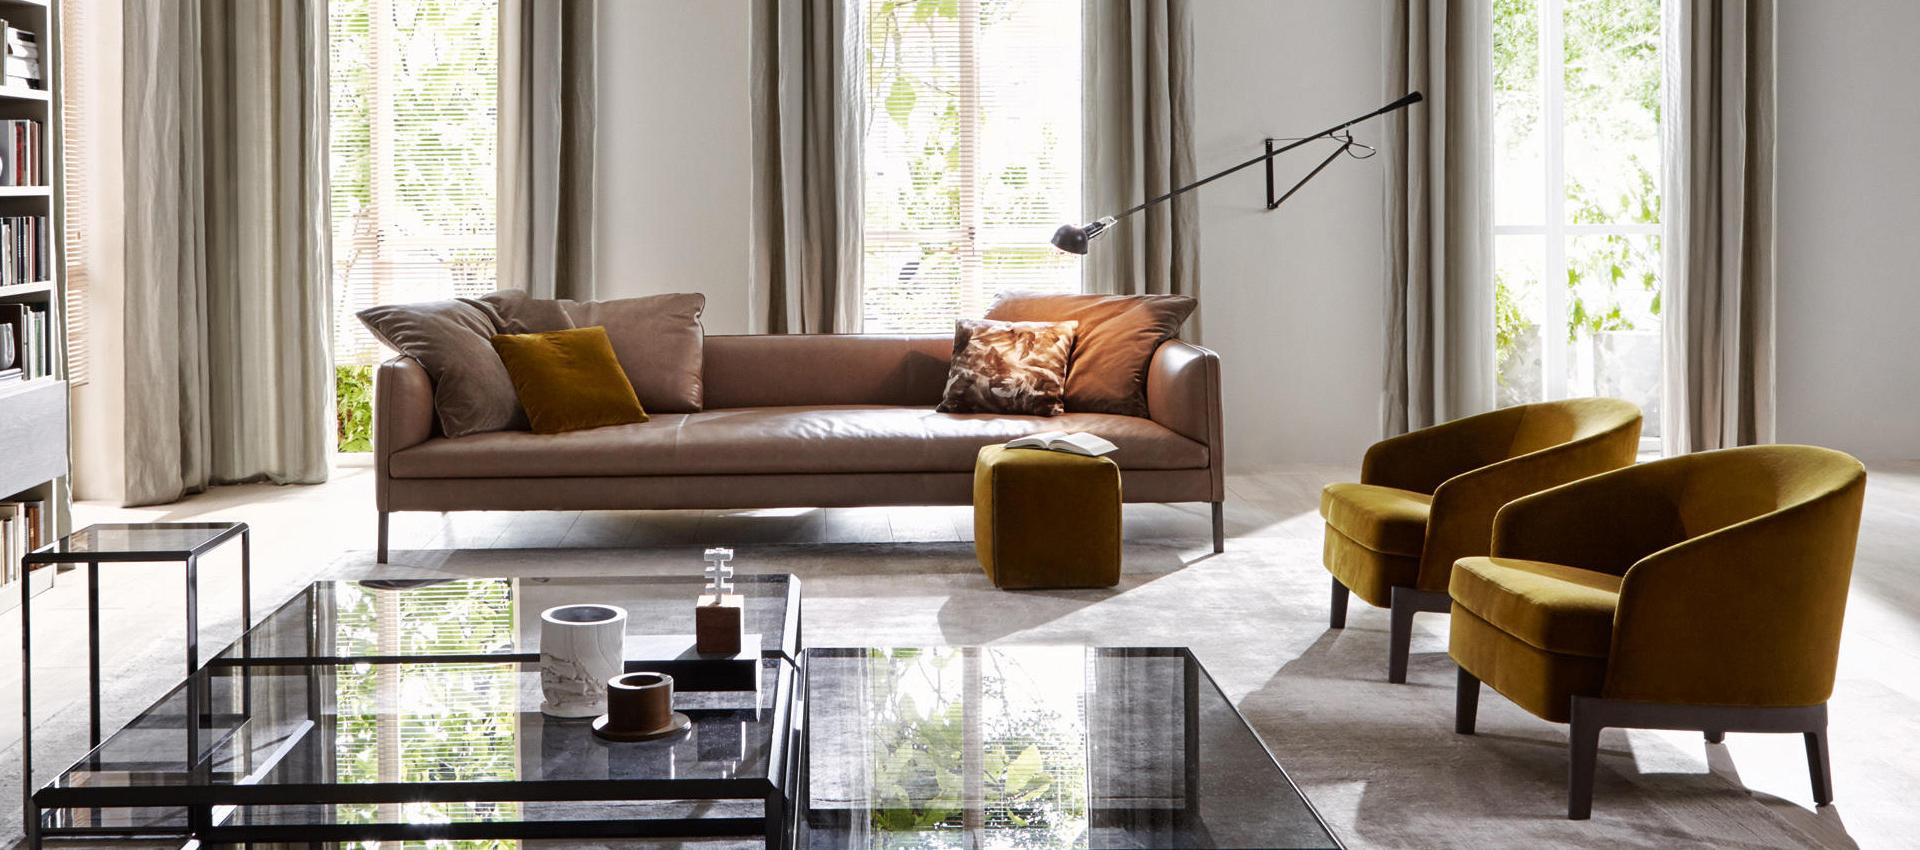 Campbell Watson Contemporary Designer Furniture Modern Lighting